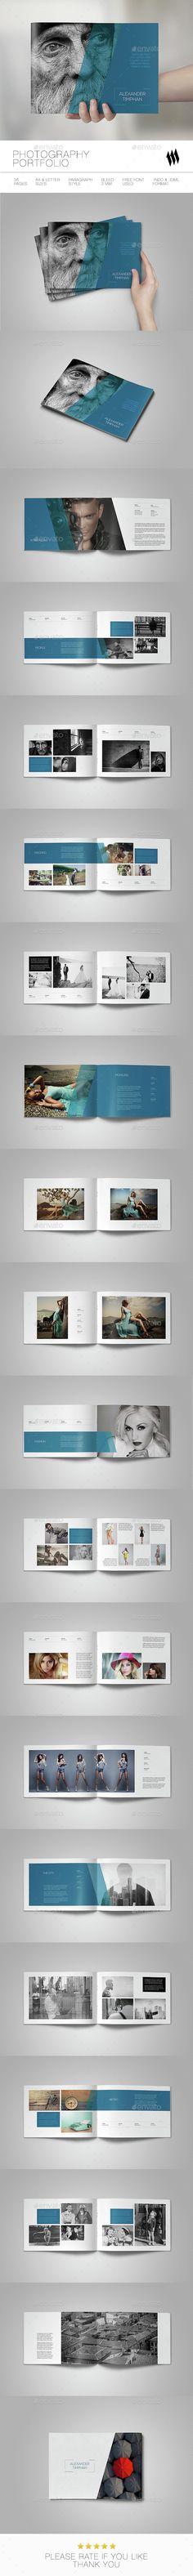 Photography Portfolio Brochure Template InDesign INDD. Download here: http://graphicriver.net/item/photography-portfolio/14869320?ref=ksioks